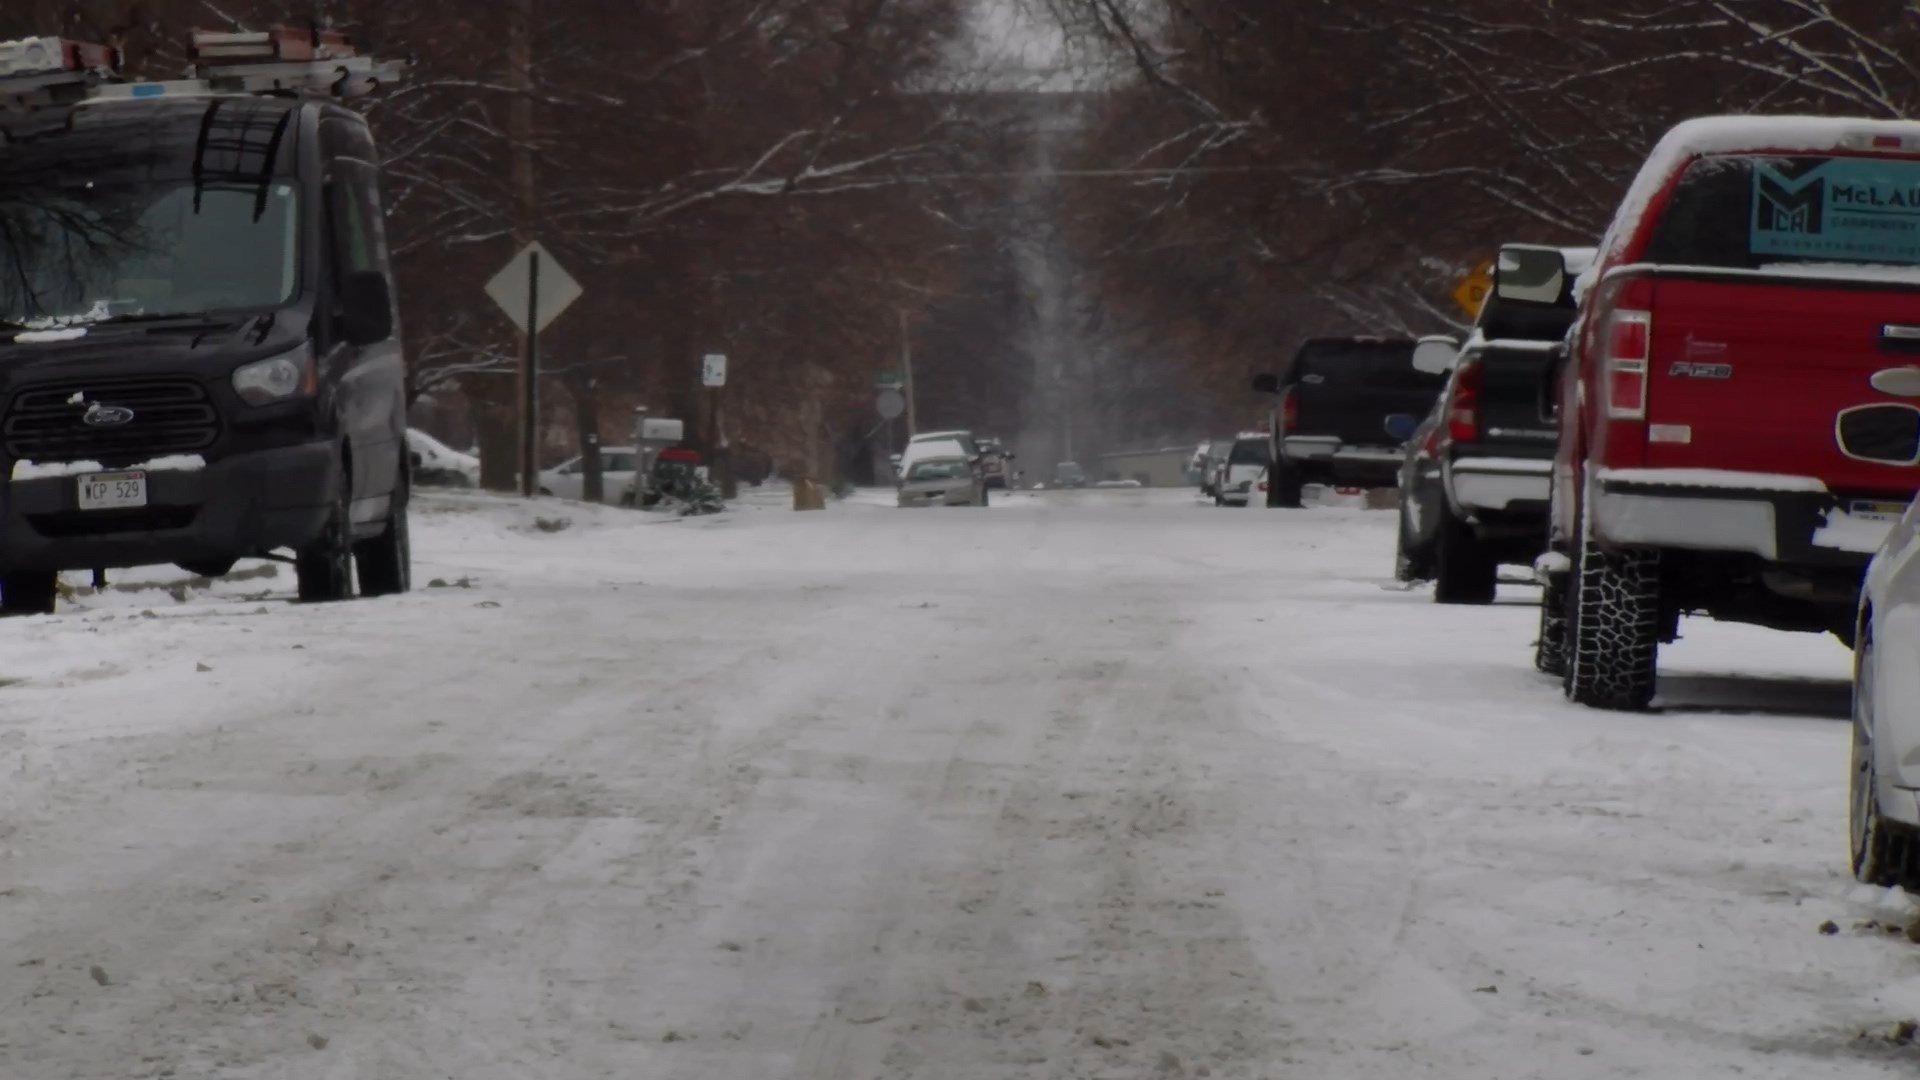 Winter storm causes fatal crash on I-80